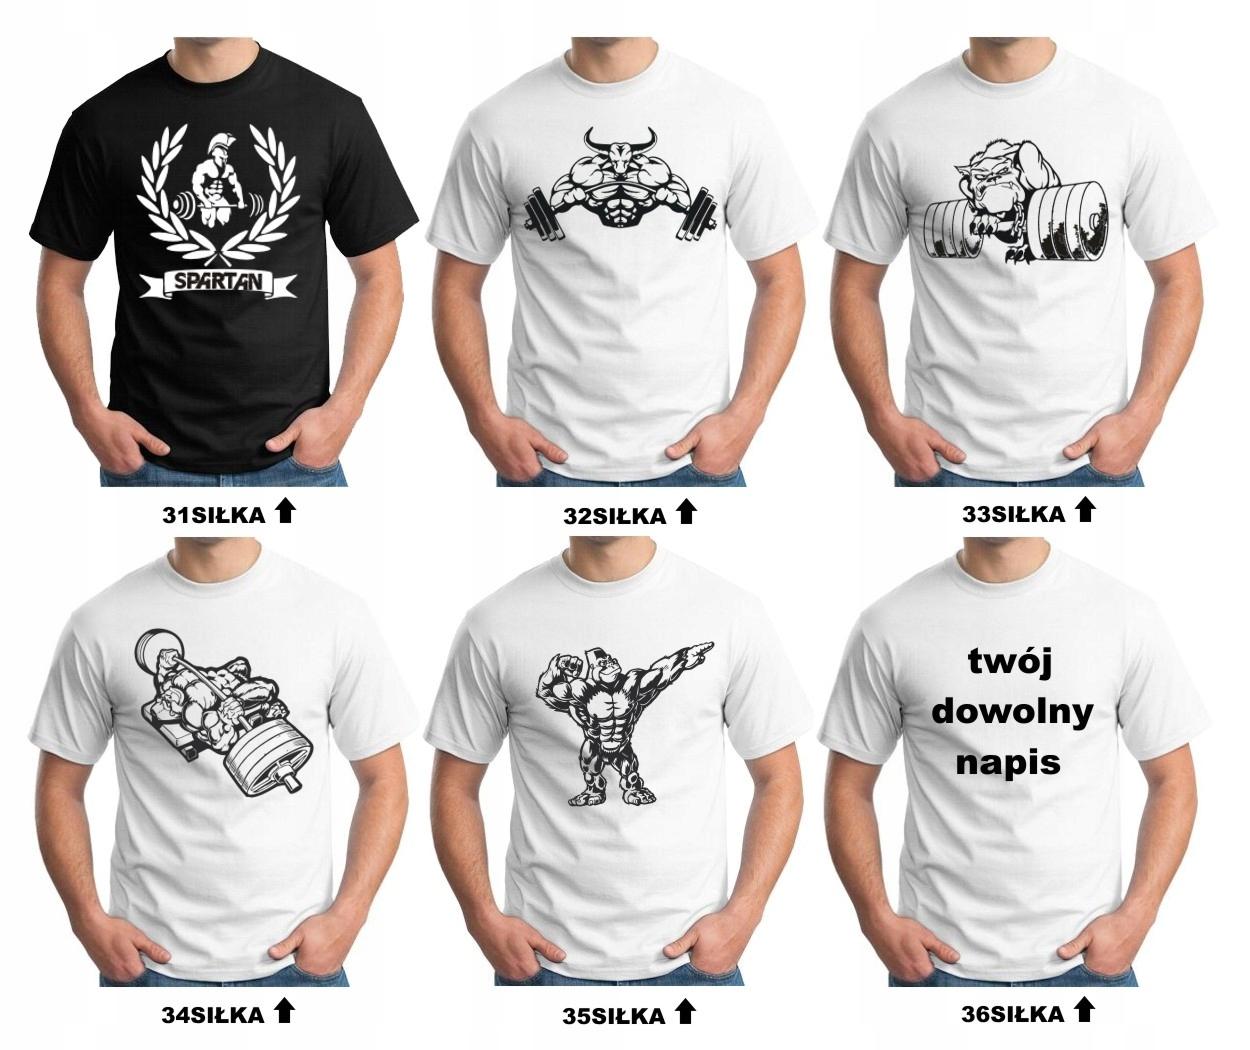 Koszulka Na Silownie Pompa Dobry Dzik Koks Sterydy 7649699772 Allegro Pl